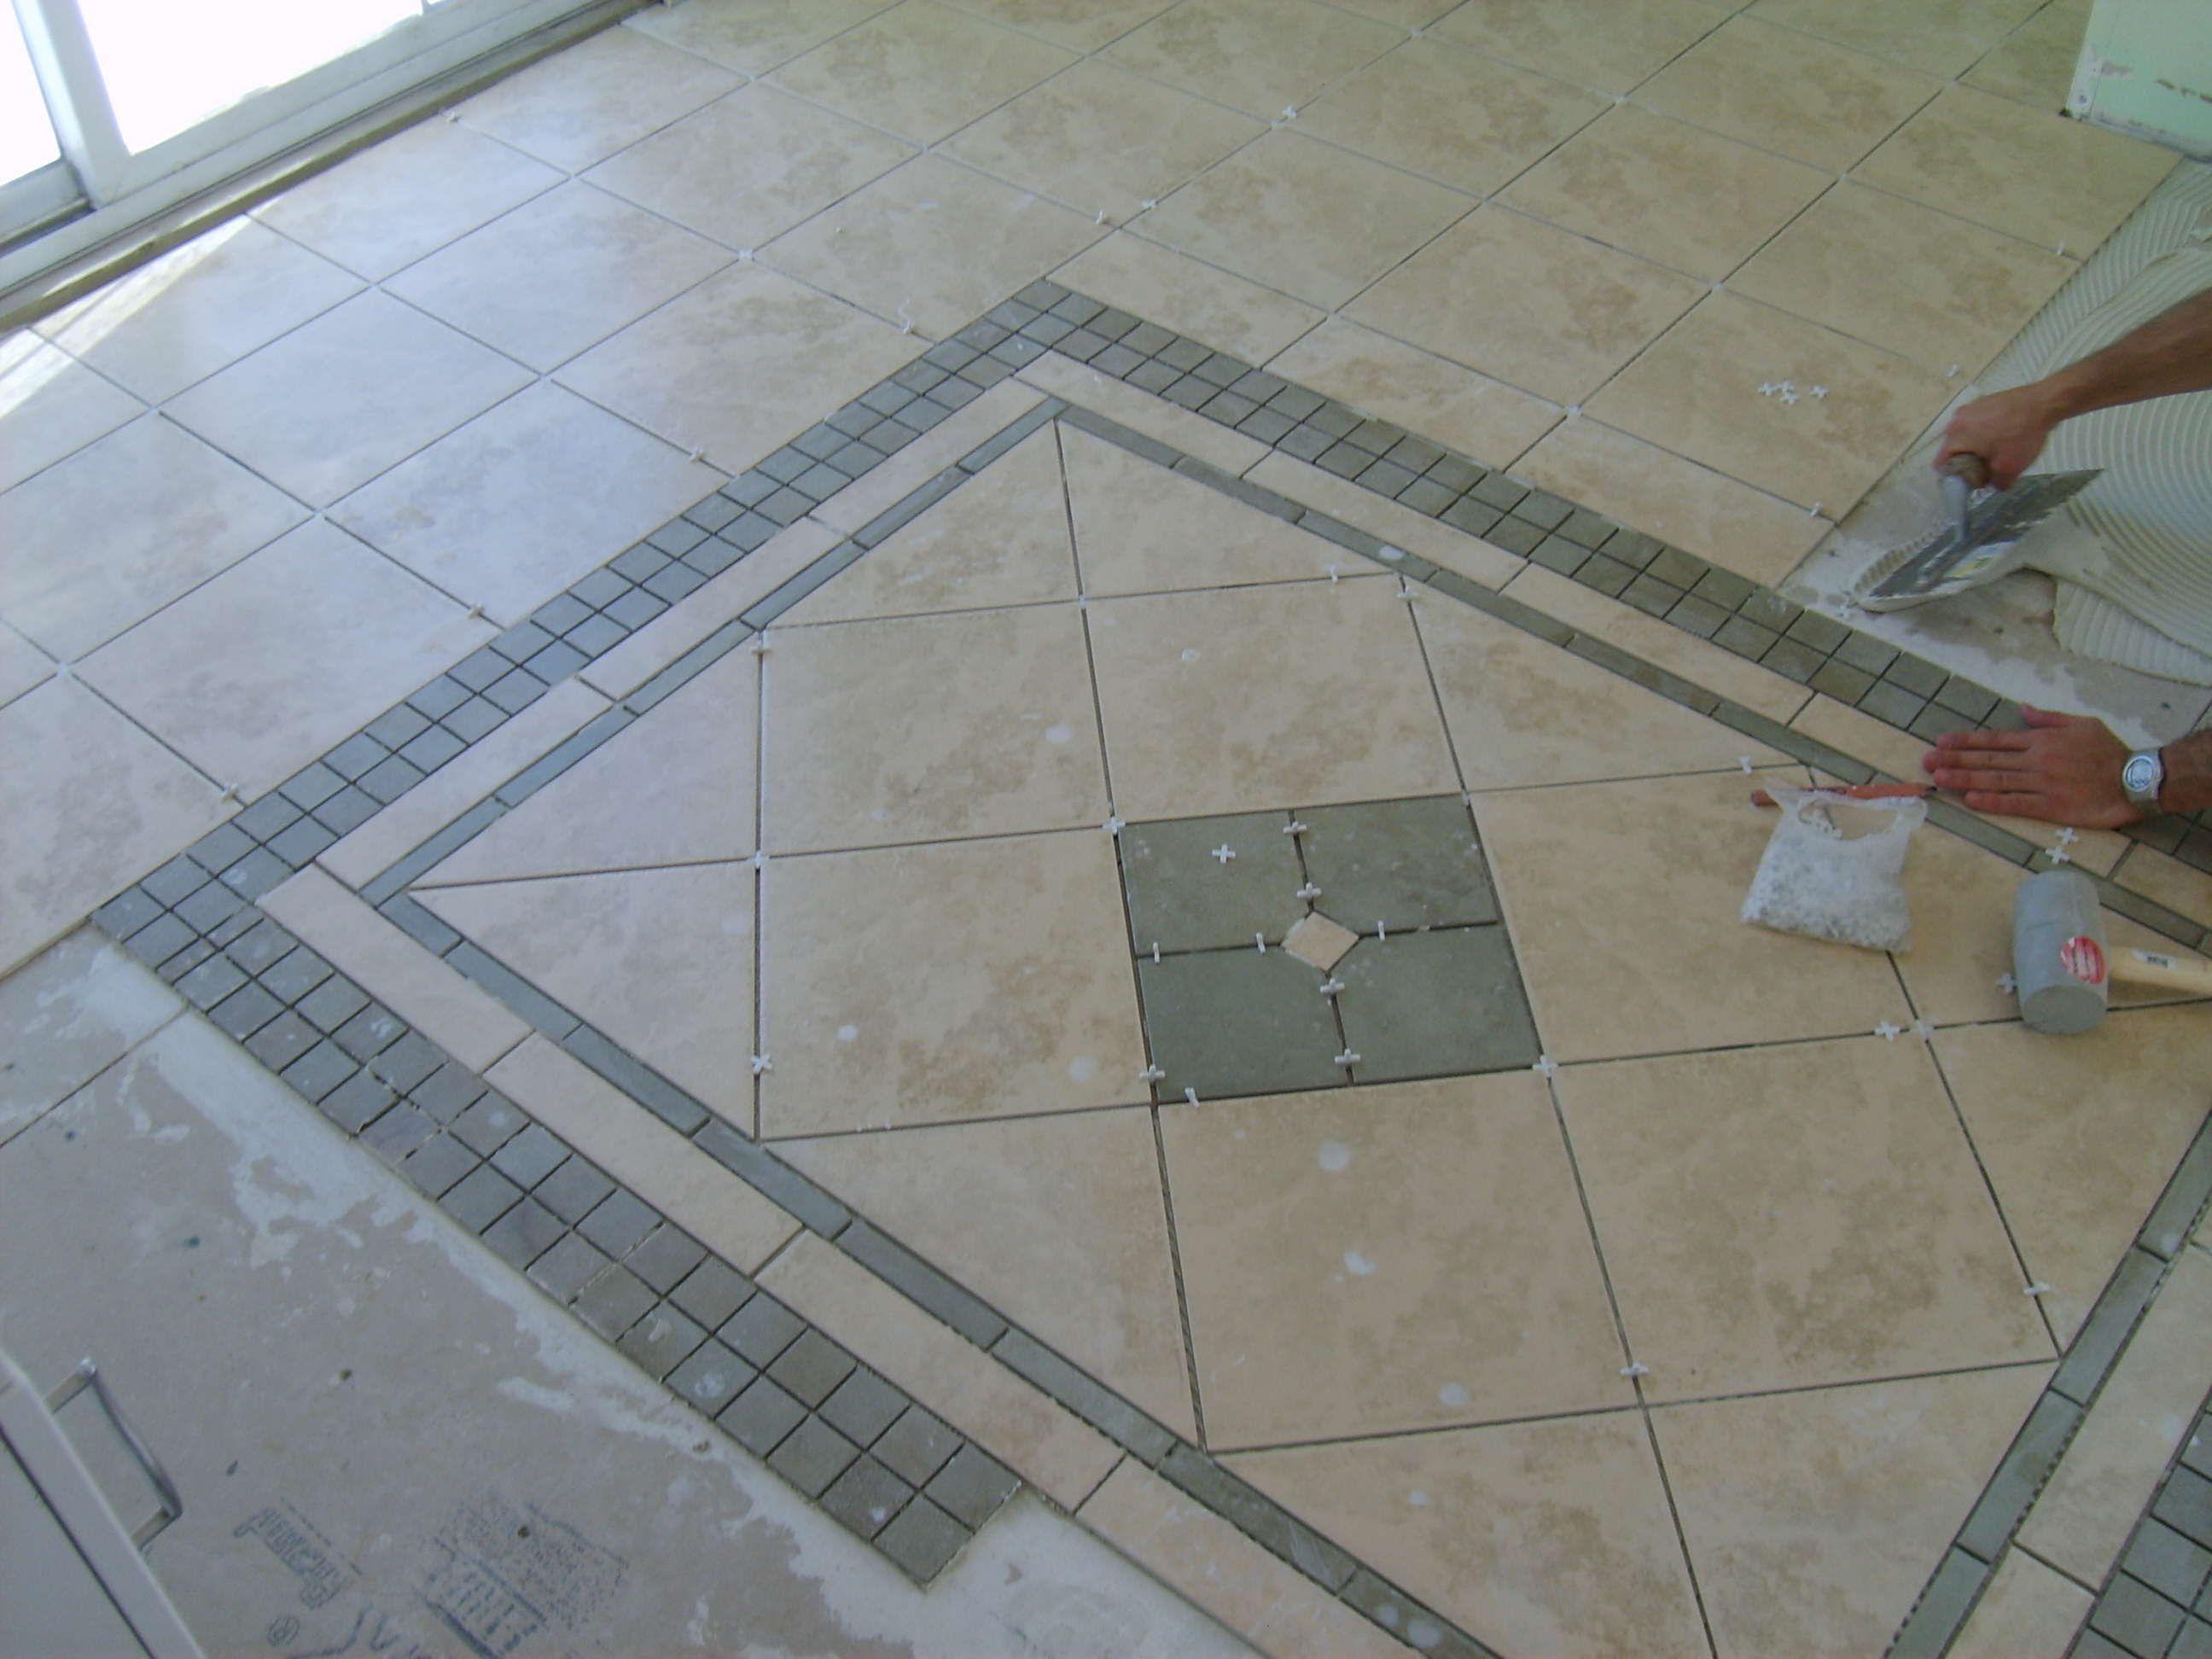 Decoration Floor Tile Design Patterns Of New Inspiration For New